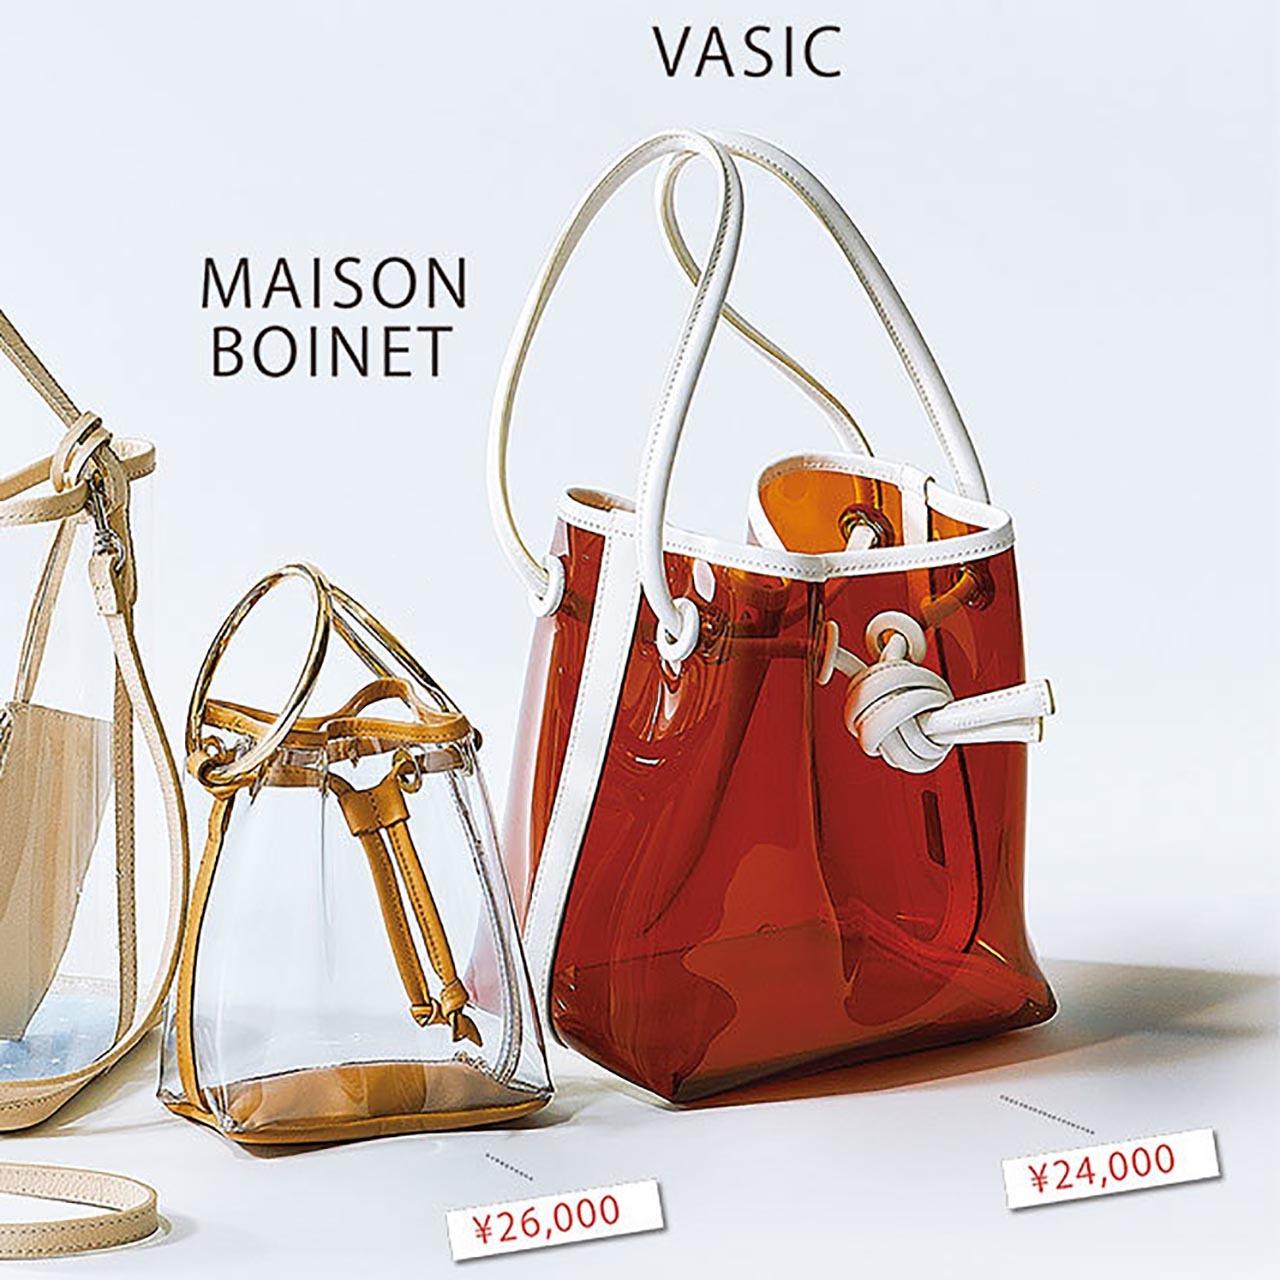 MAISON BOINETとVASICのPVCバッグ